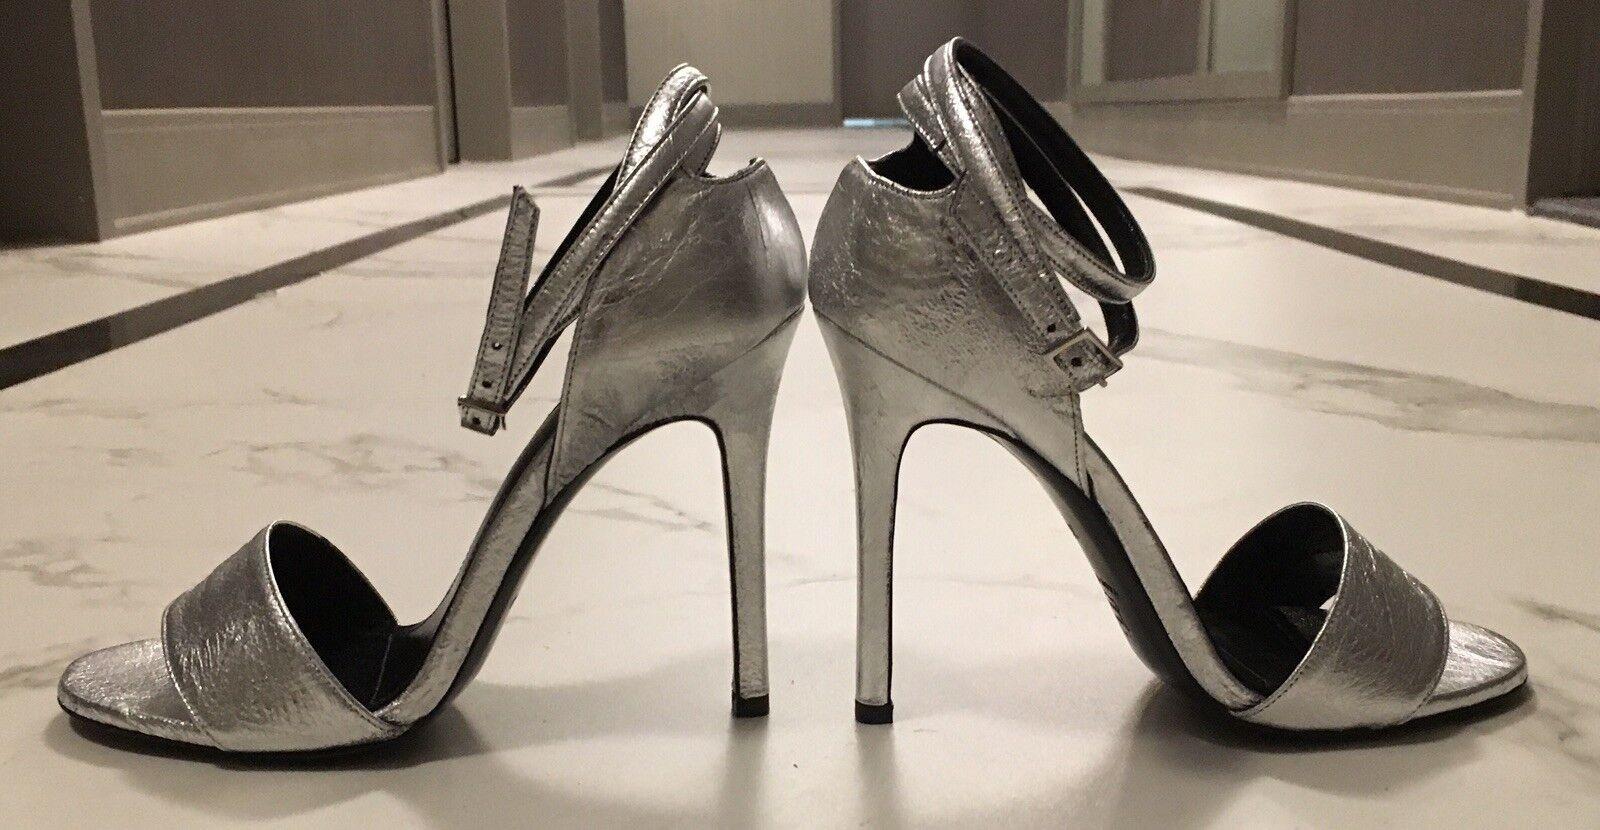 NWB Scanlan Theodore argent Leather High High High Heel Ankle Strap Sandals Stilettos 37 5a15b9